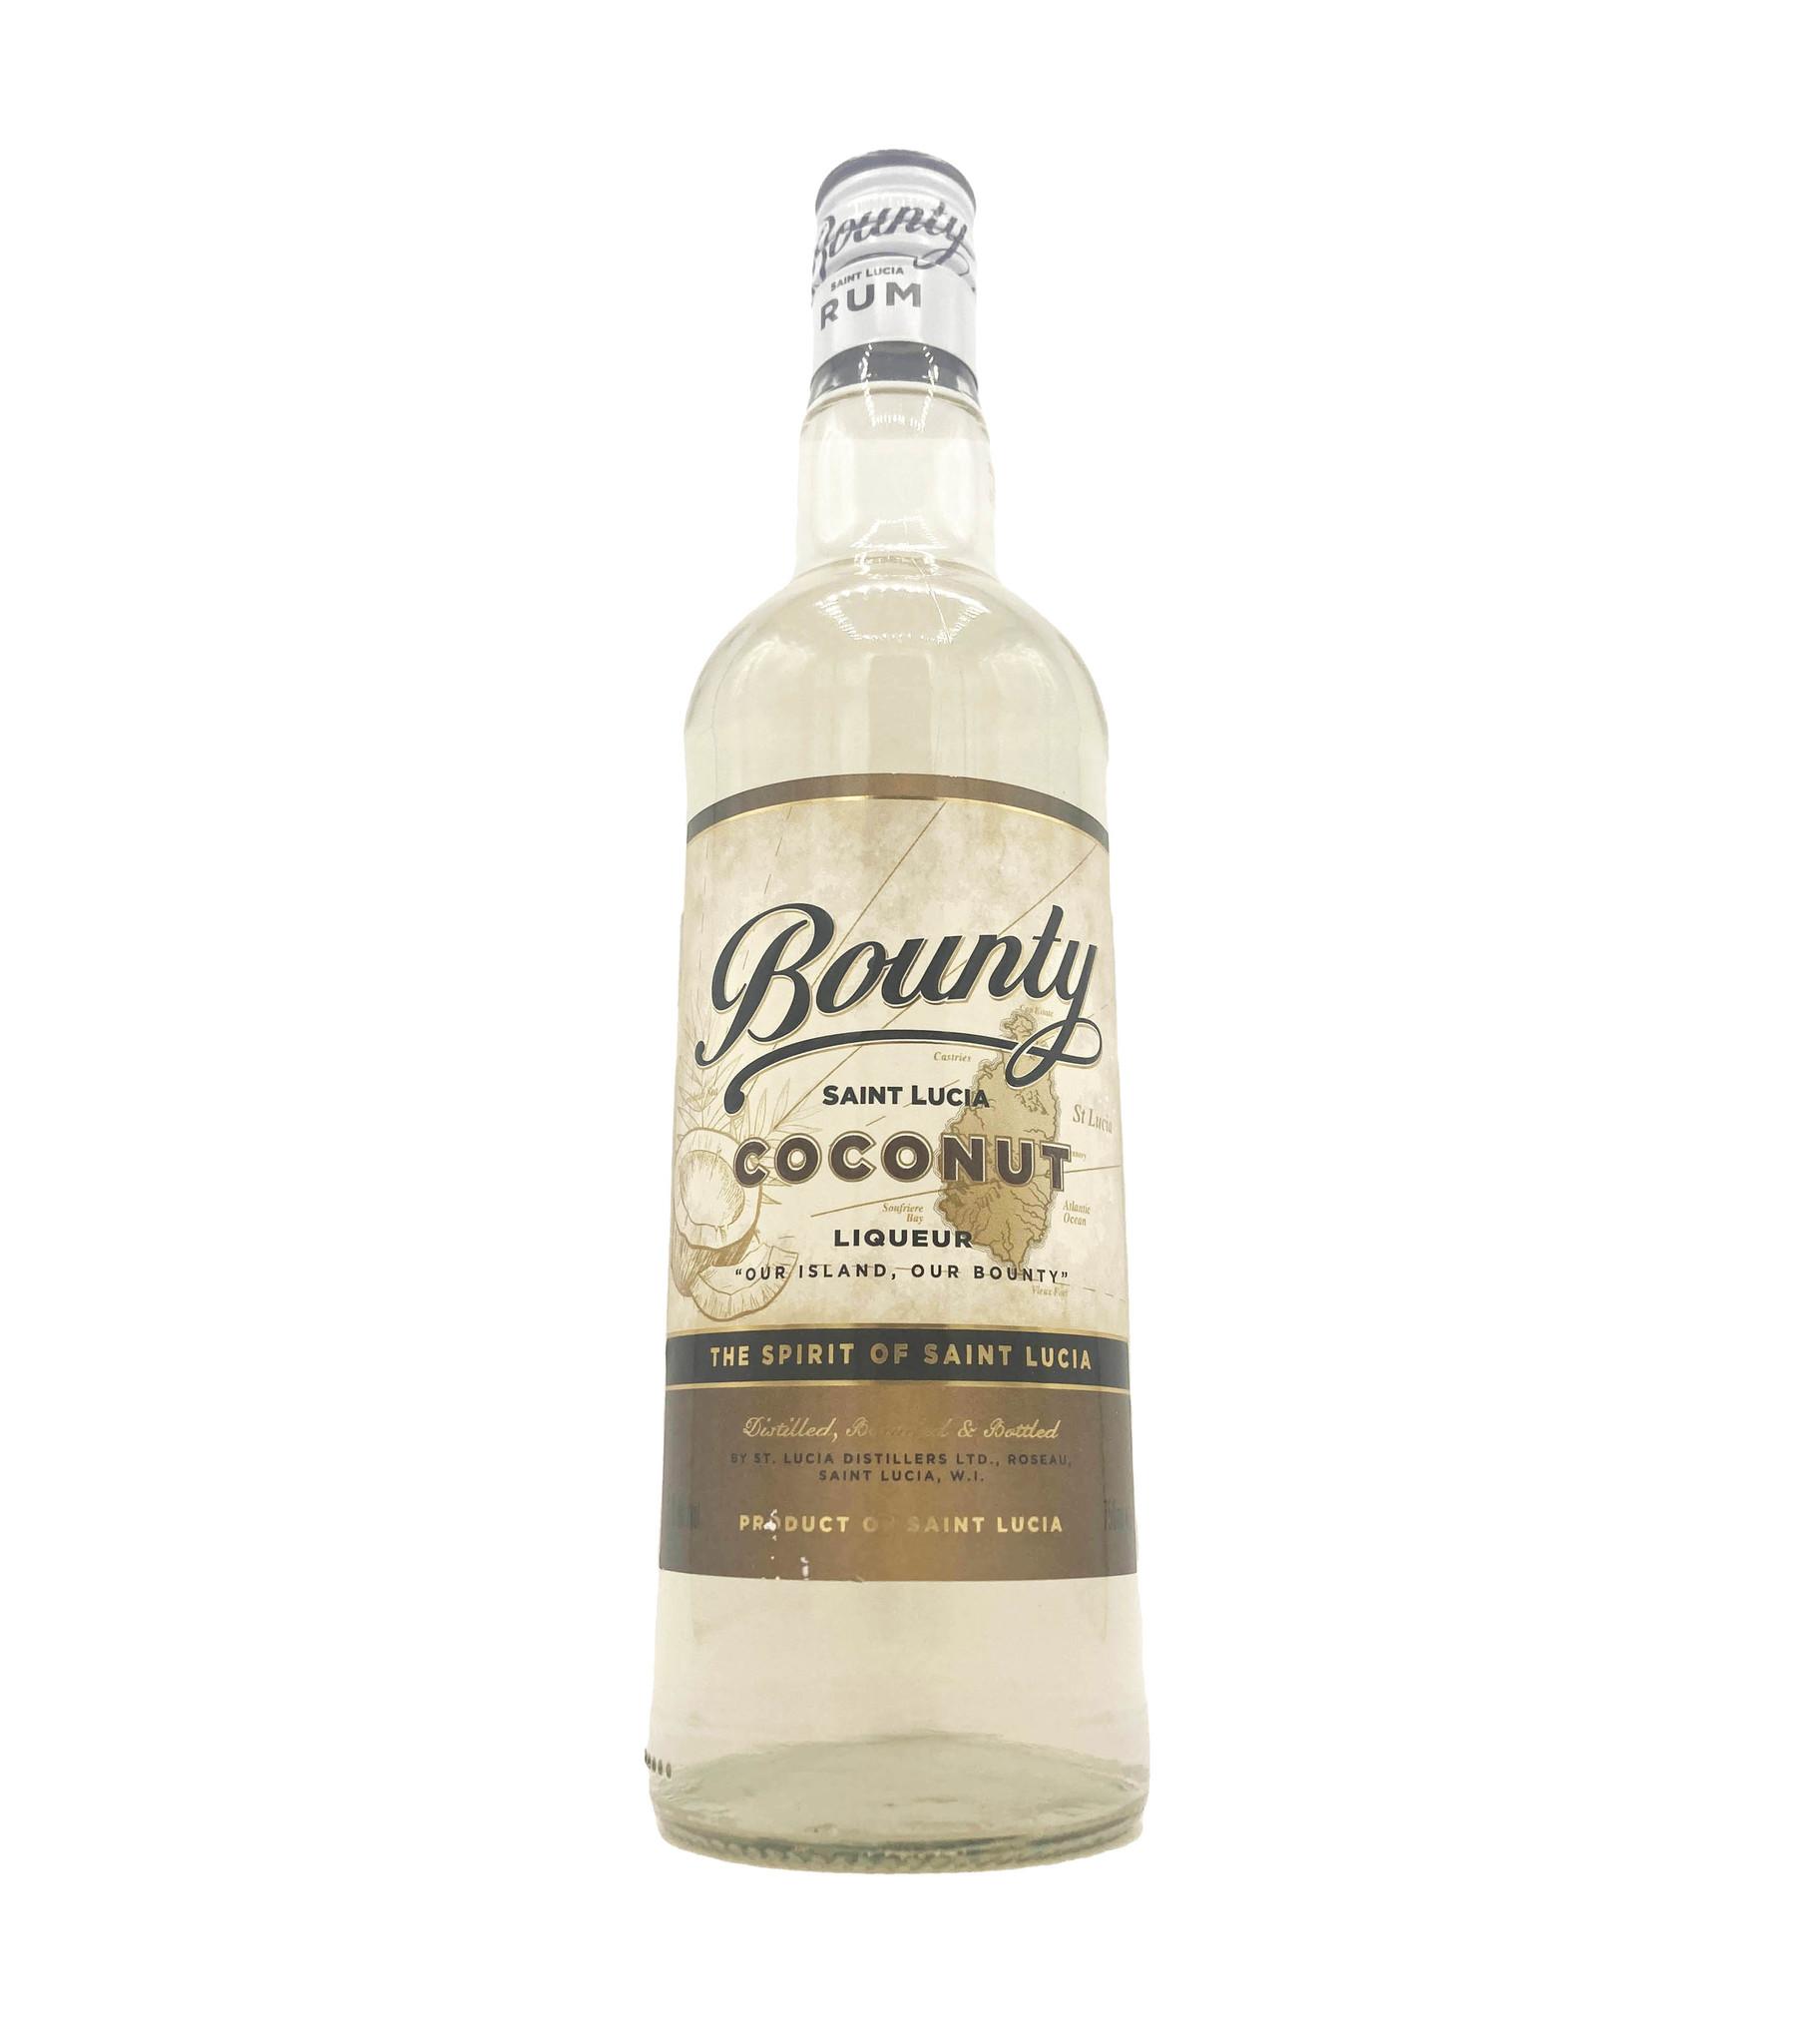 Bounty Coconut Rum Liqueur